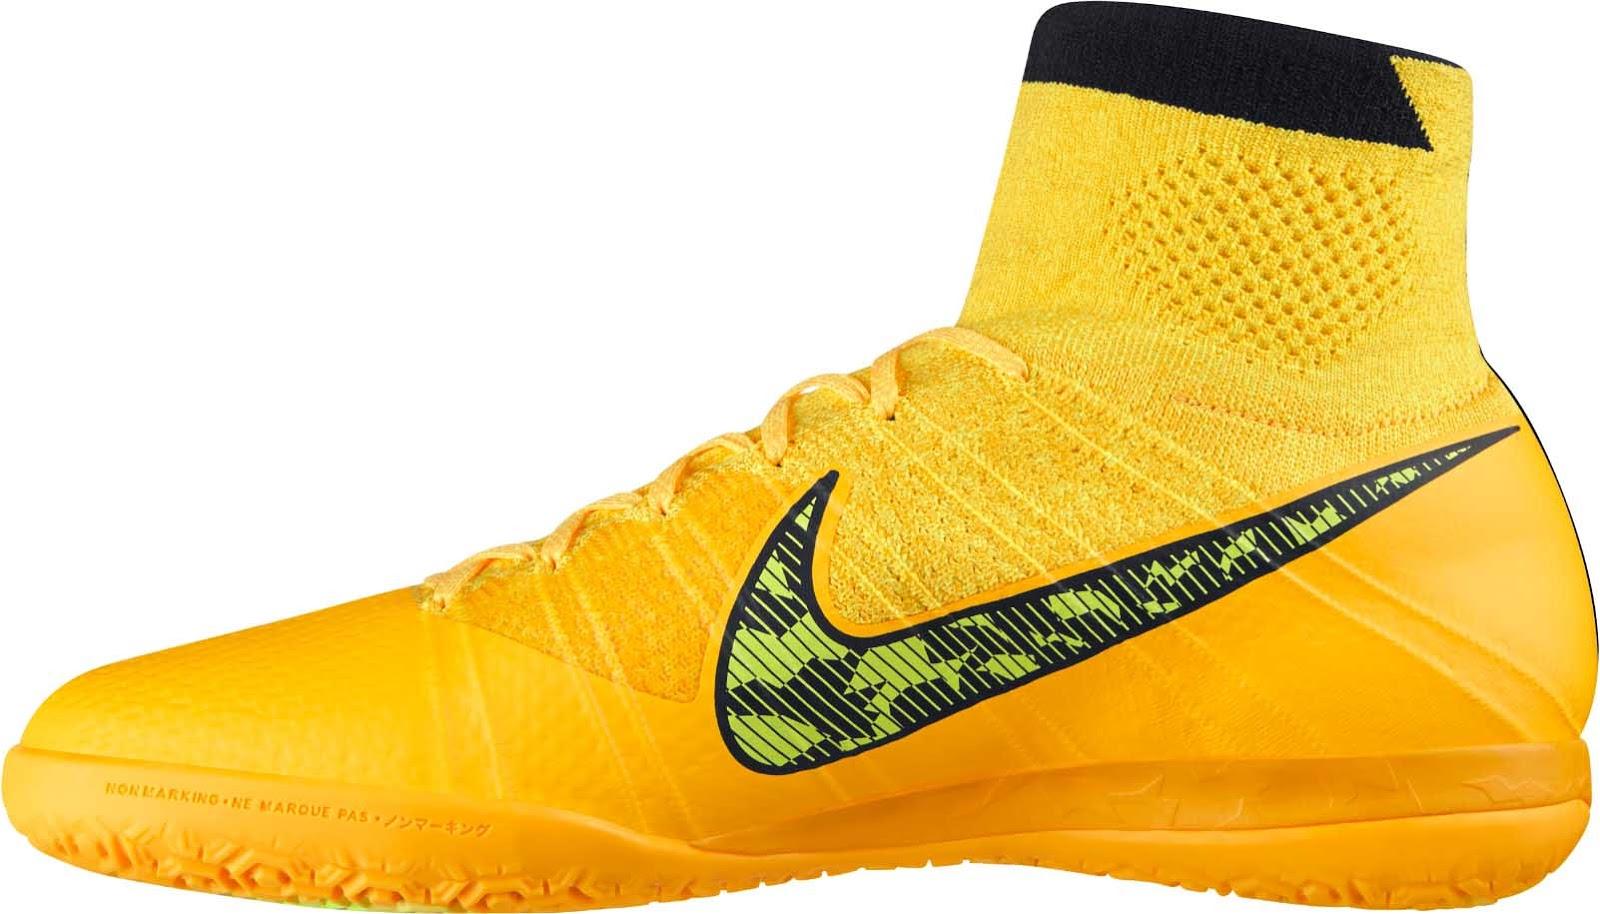 2fcf1b23f06 Nike Elastico Superfly IC Laser Orange   Black   White   Volt